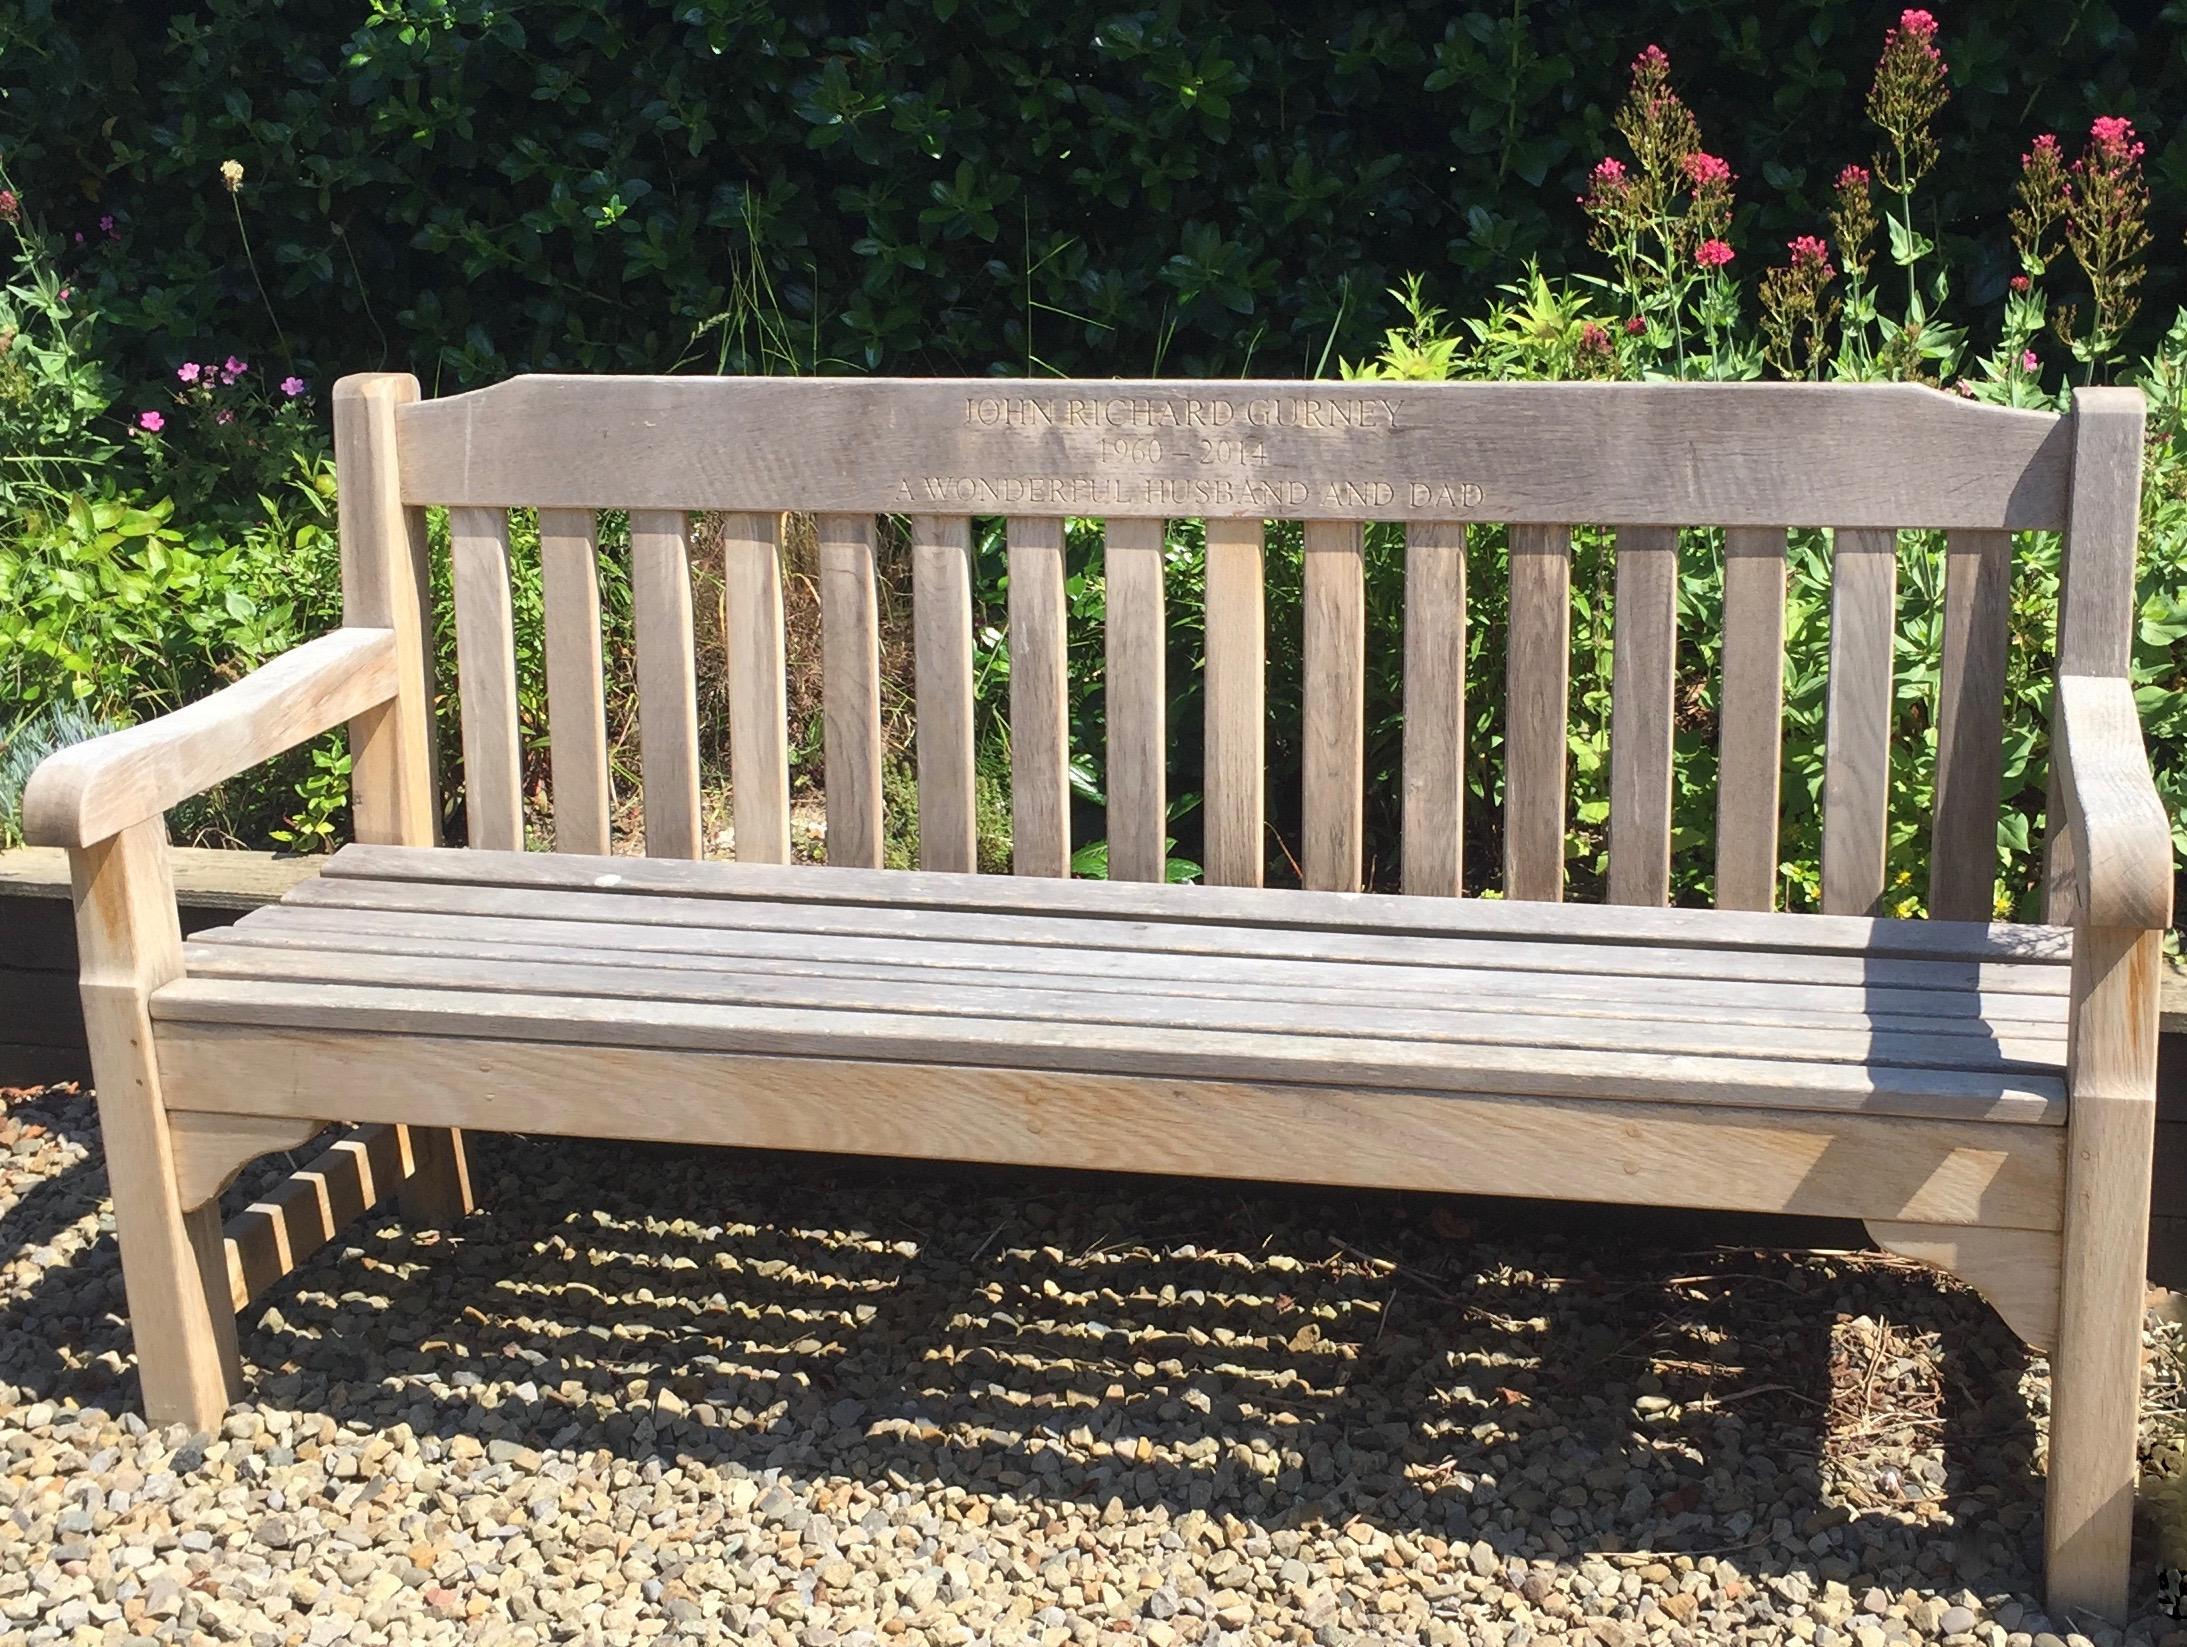 Bench in memory of John Gurney. Image by Rachel Hammersley